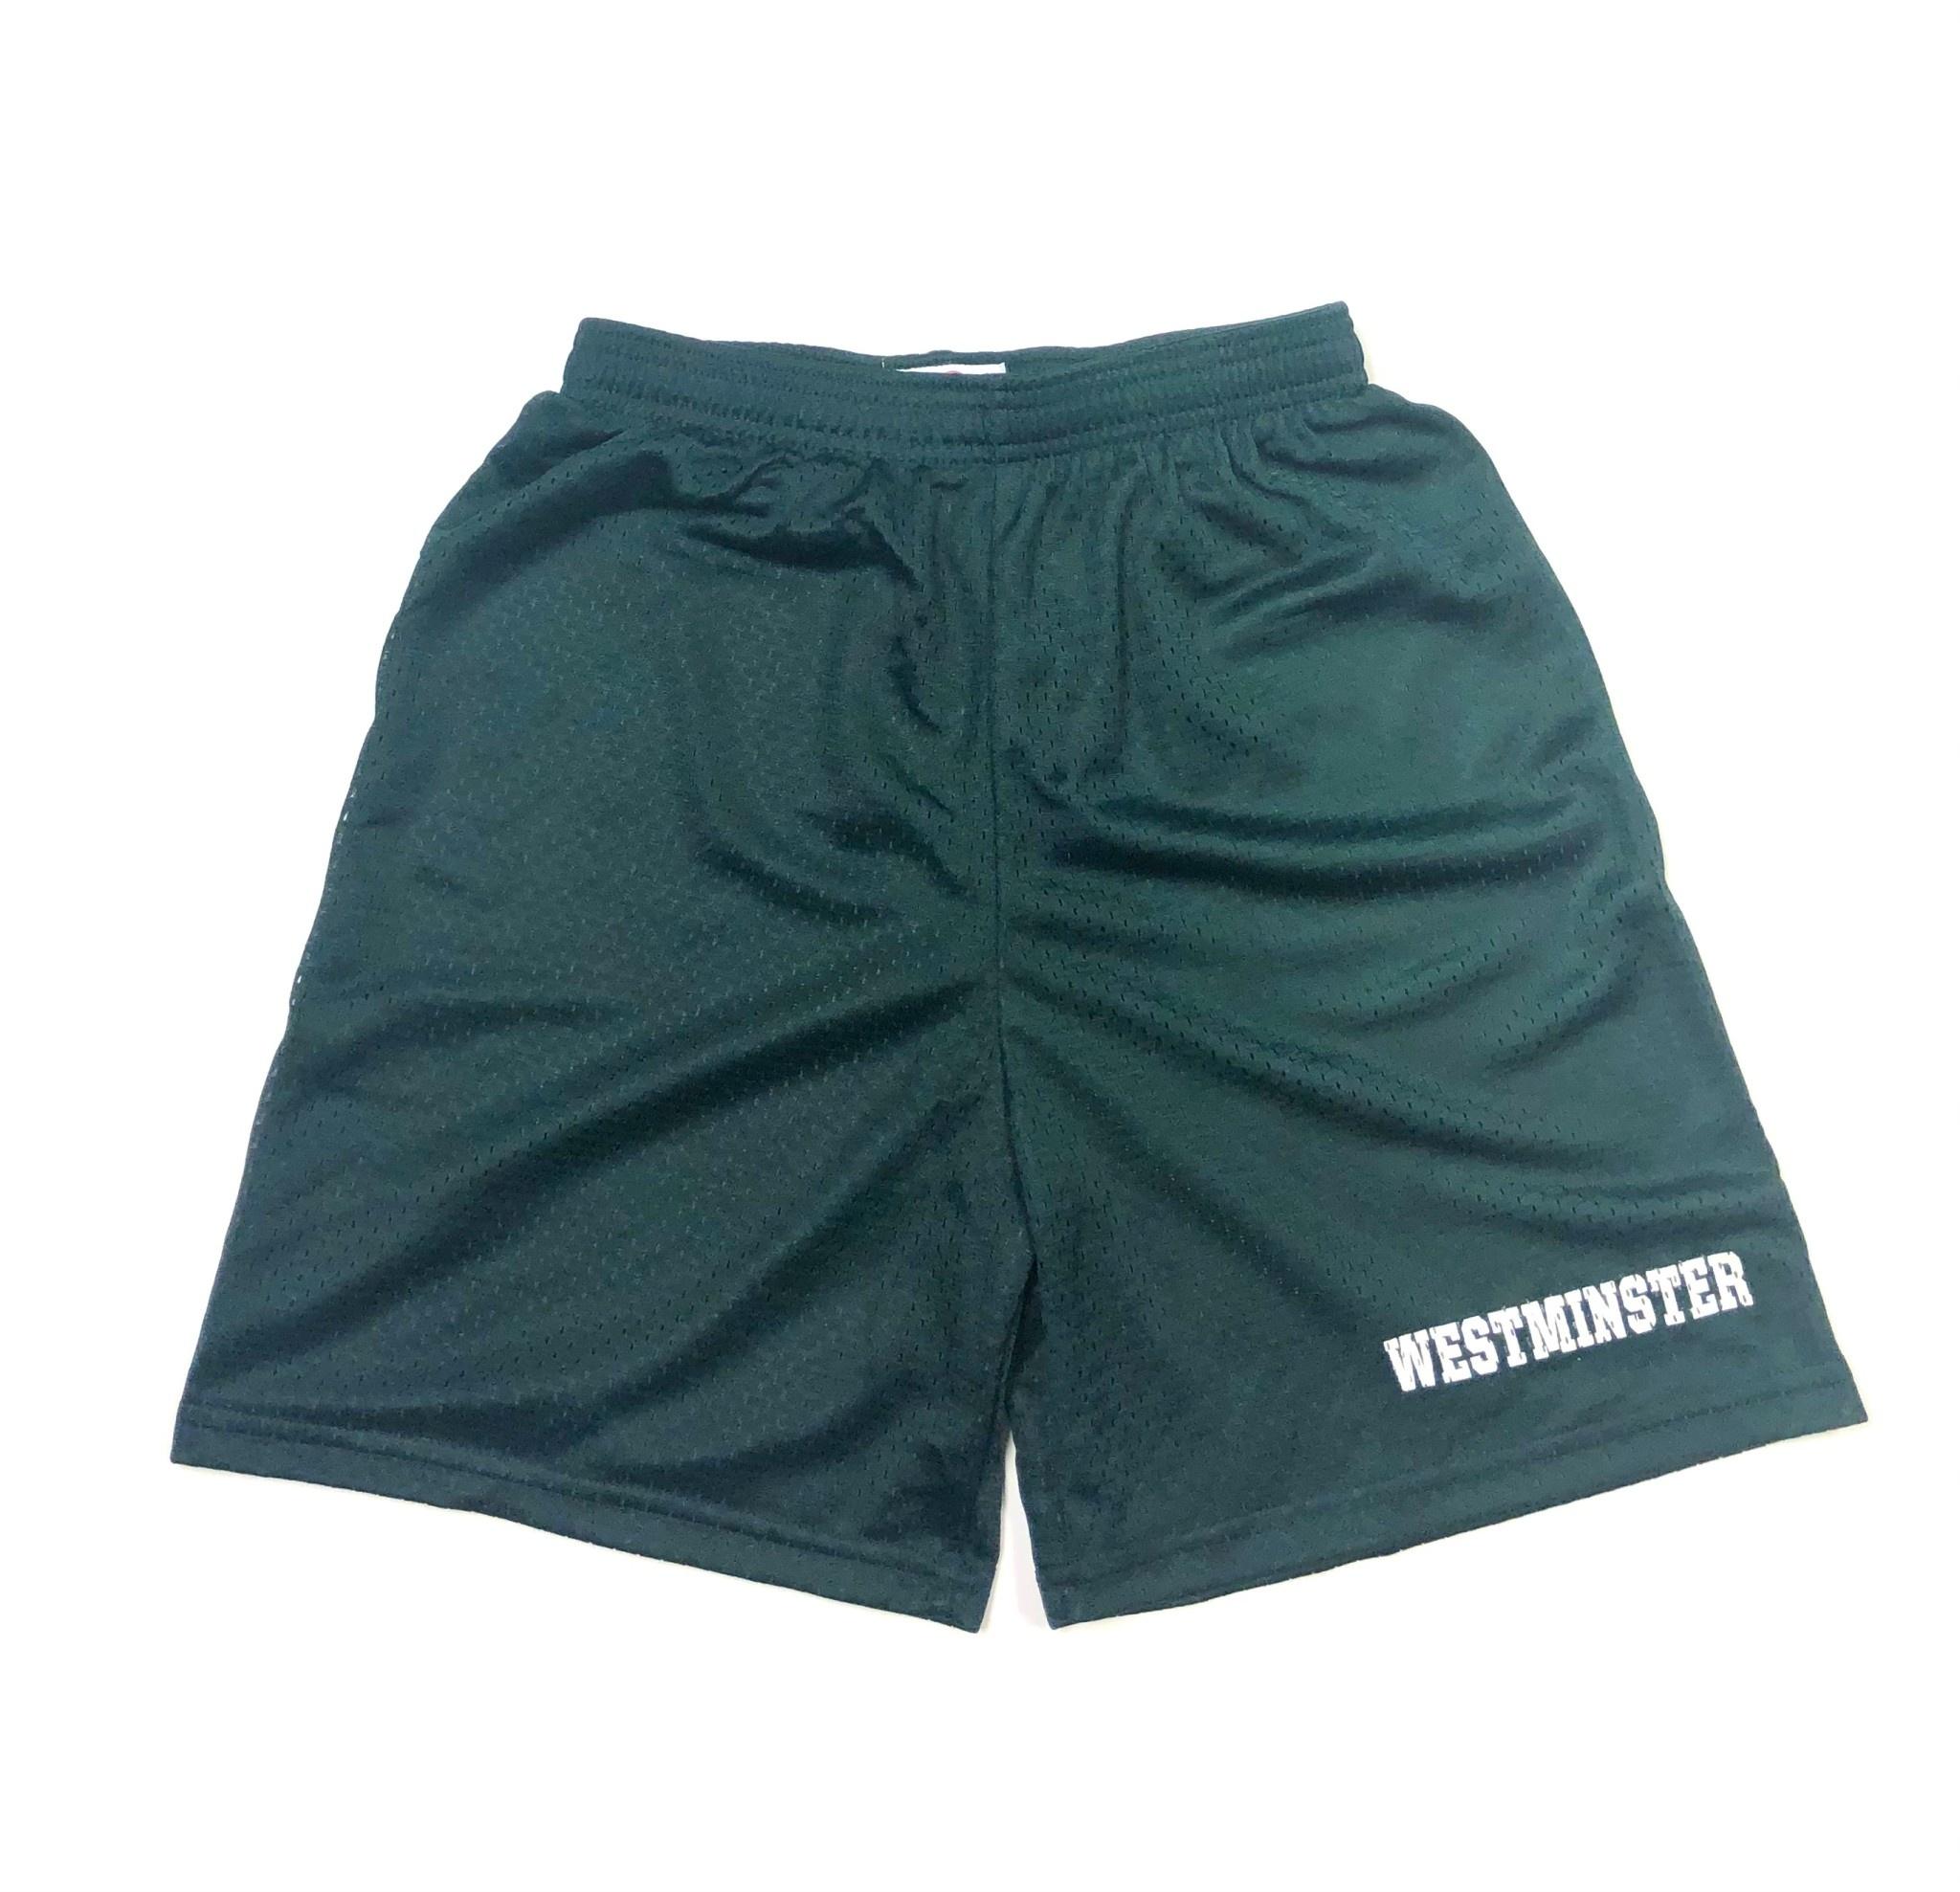 Middle School PE Shorts